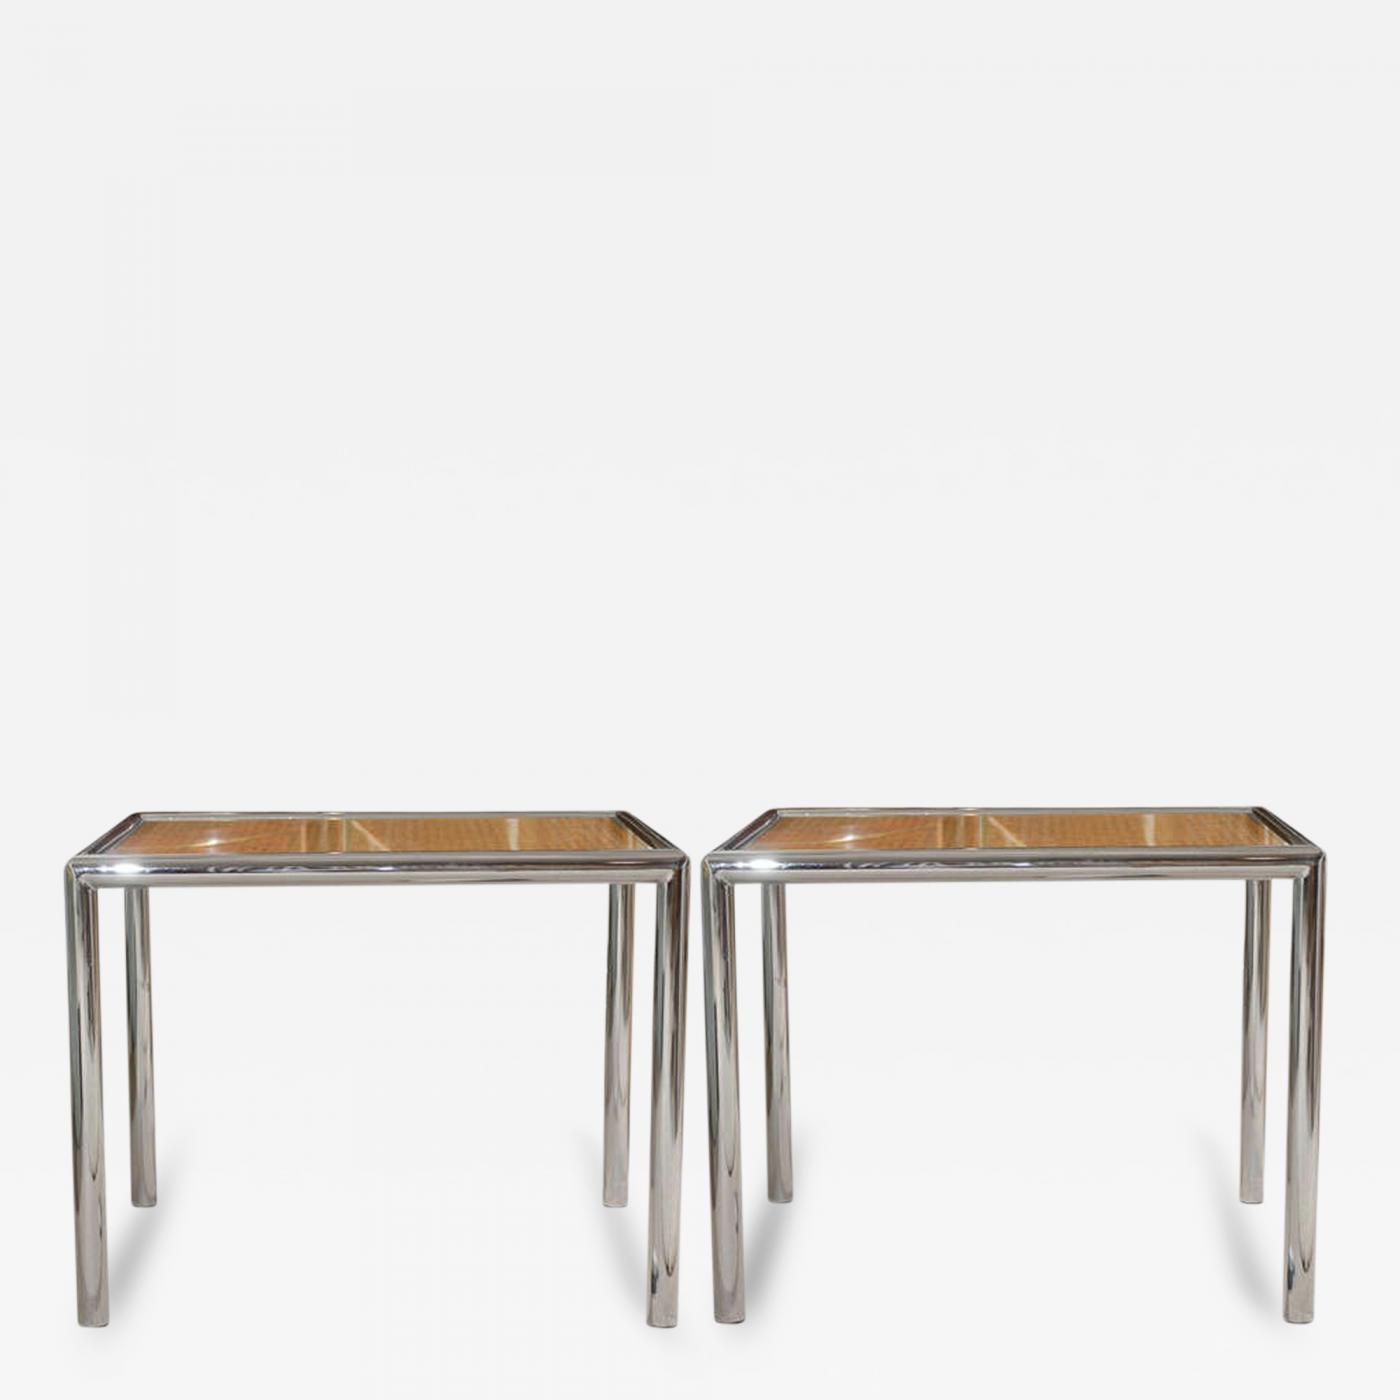 Milo Baughman Pair of Milo Baughman Cane Chrome End or Side Tables